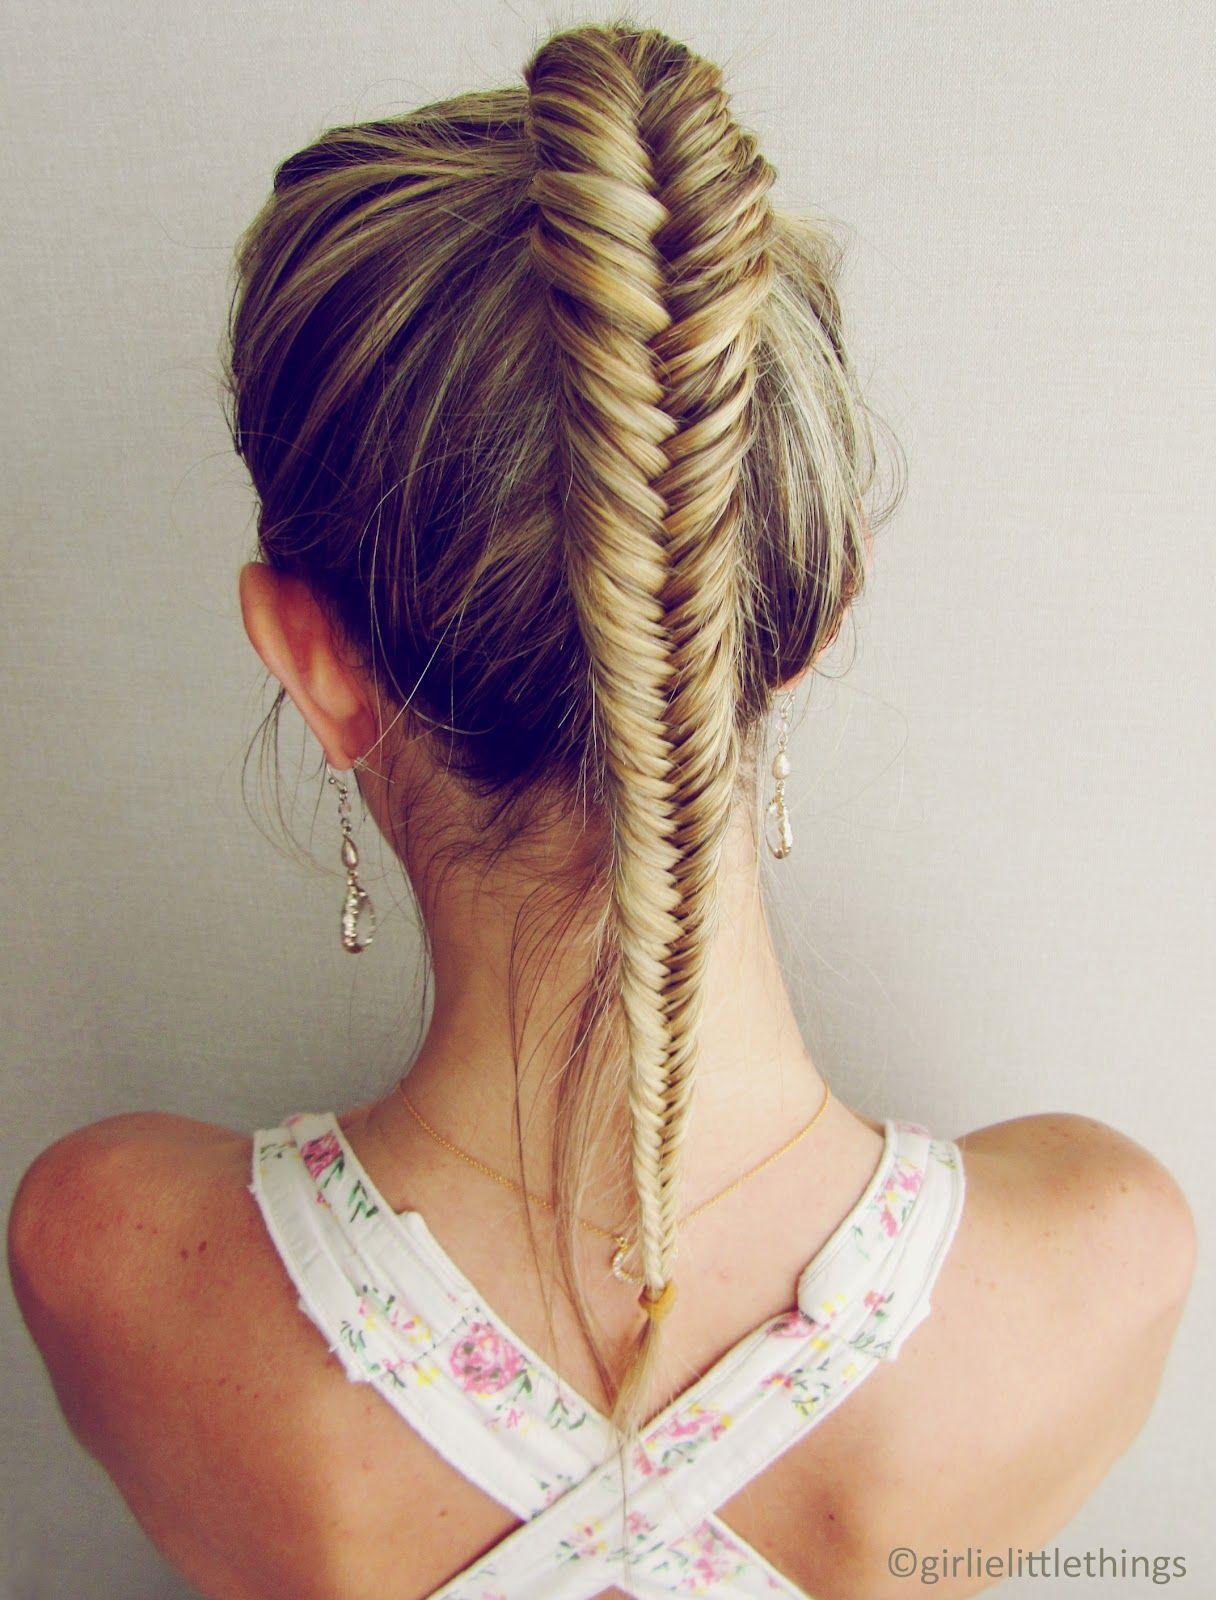 Burcu Arkut A Perfect Braid Hair Styles Fishtail Ponytail Fish Tail Braid